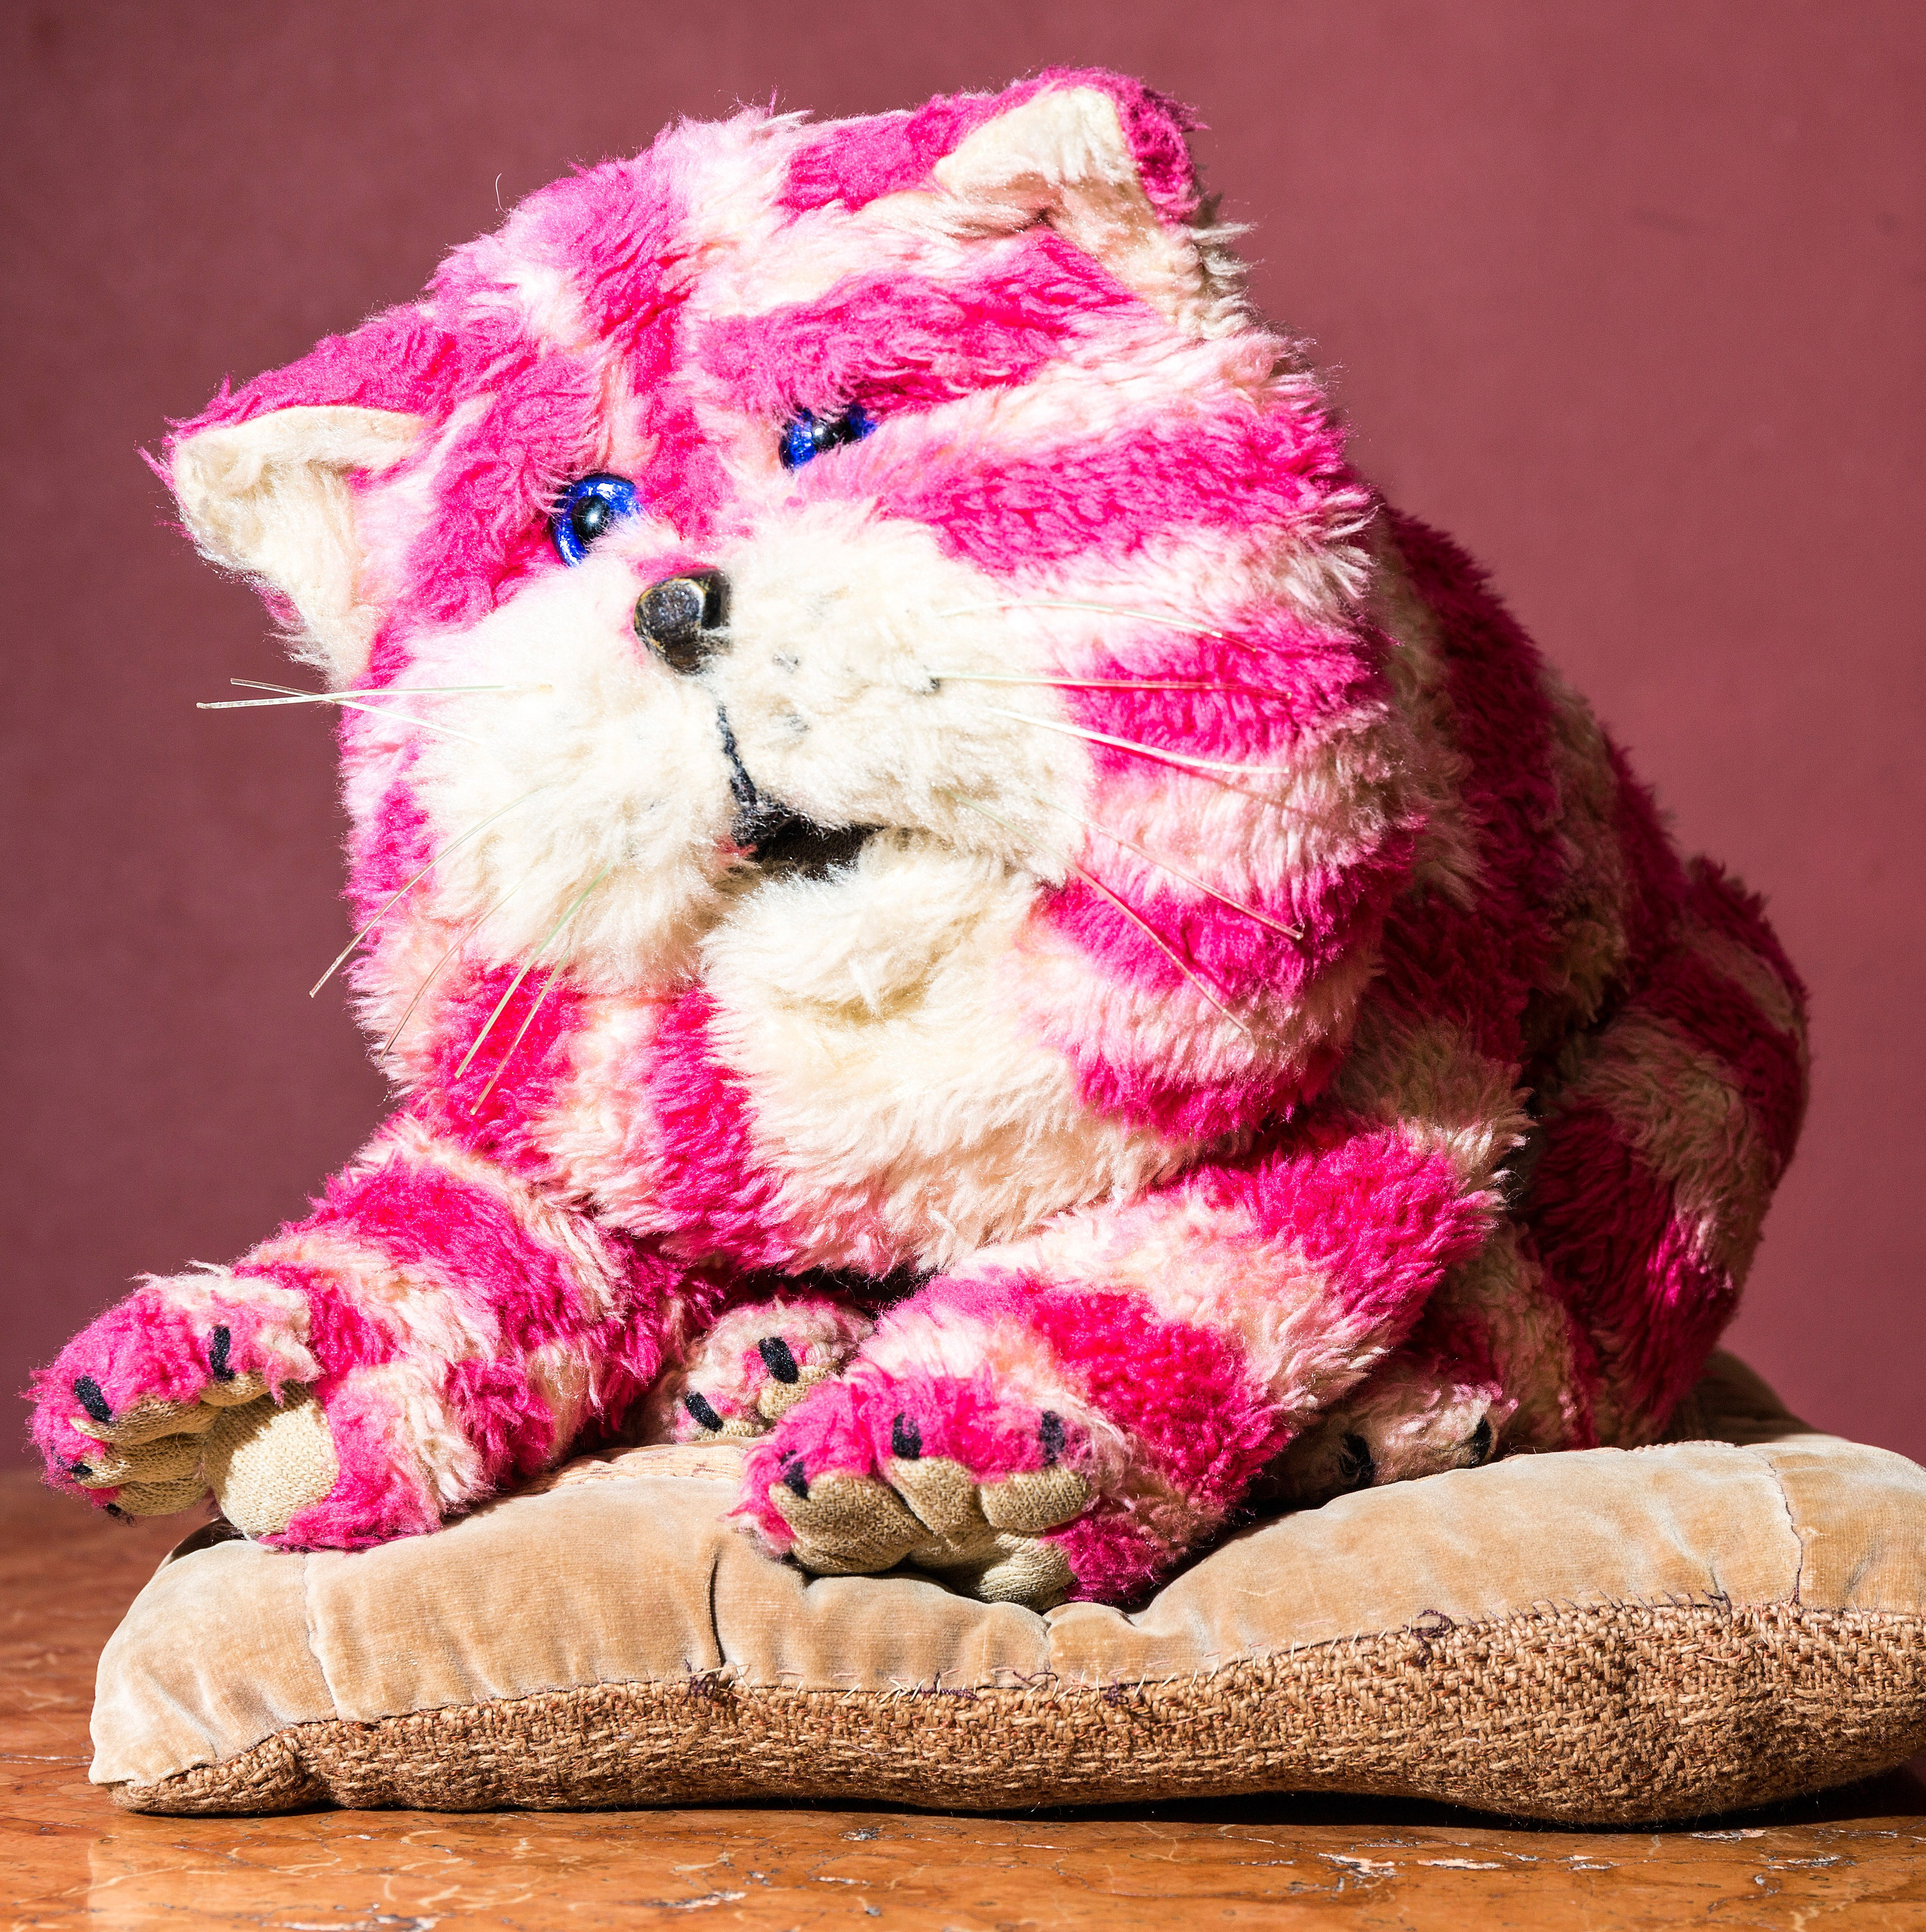 Vintage Bagpuss the cat plush toy